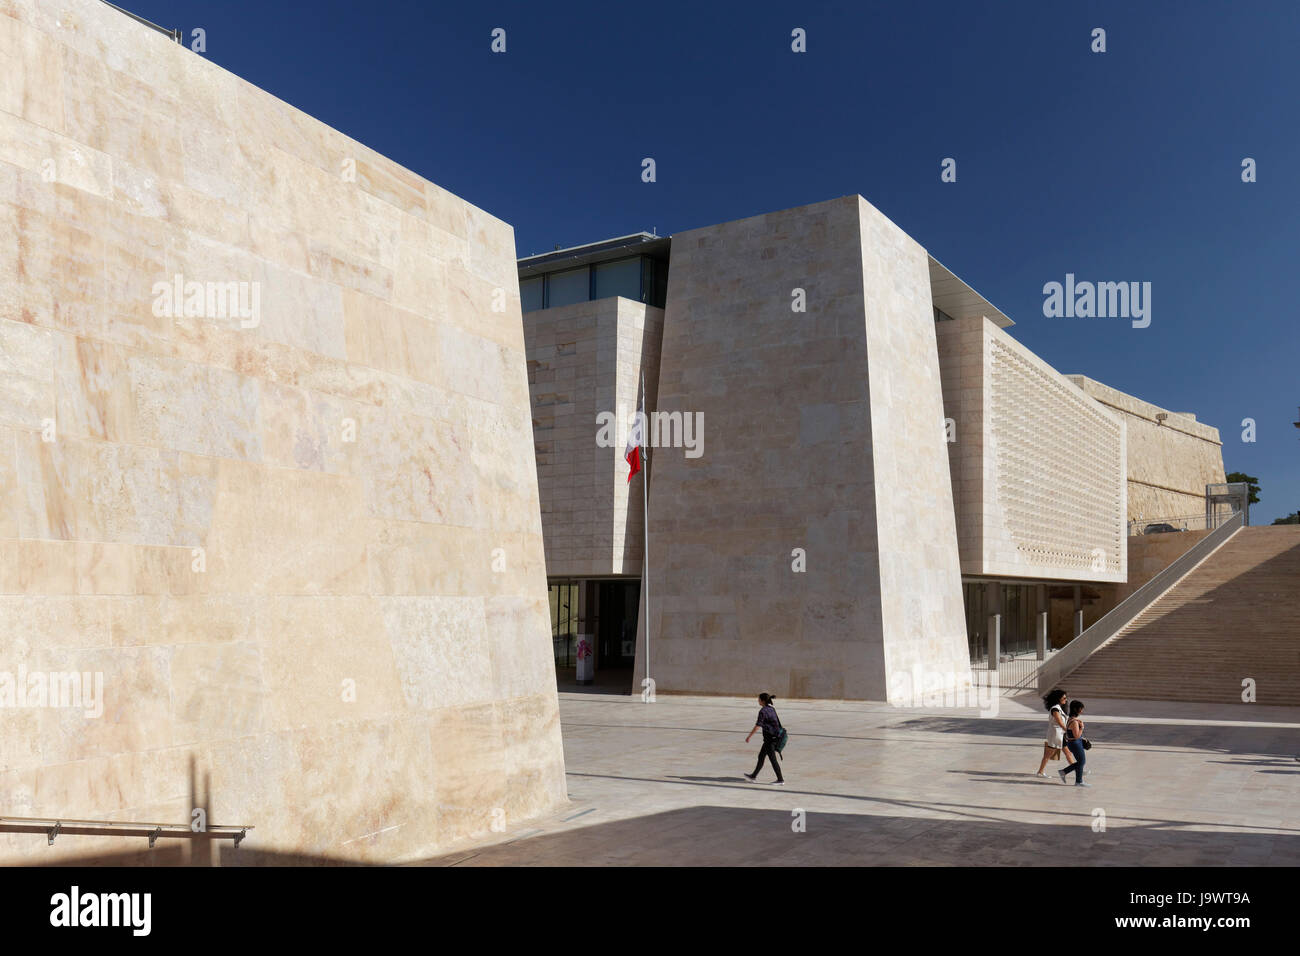 Valletta City Gate, modern city gate and parliament building, architect Renzo Piano, Valletta, Malta - Stock Image